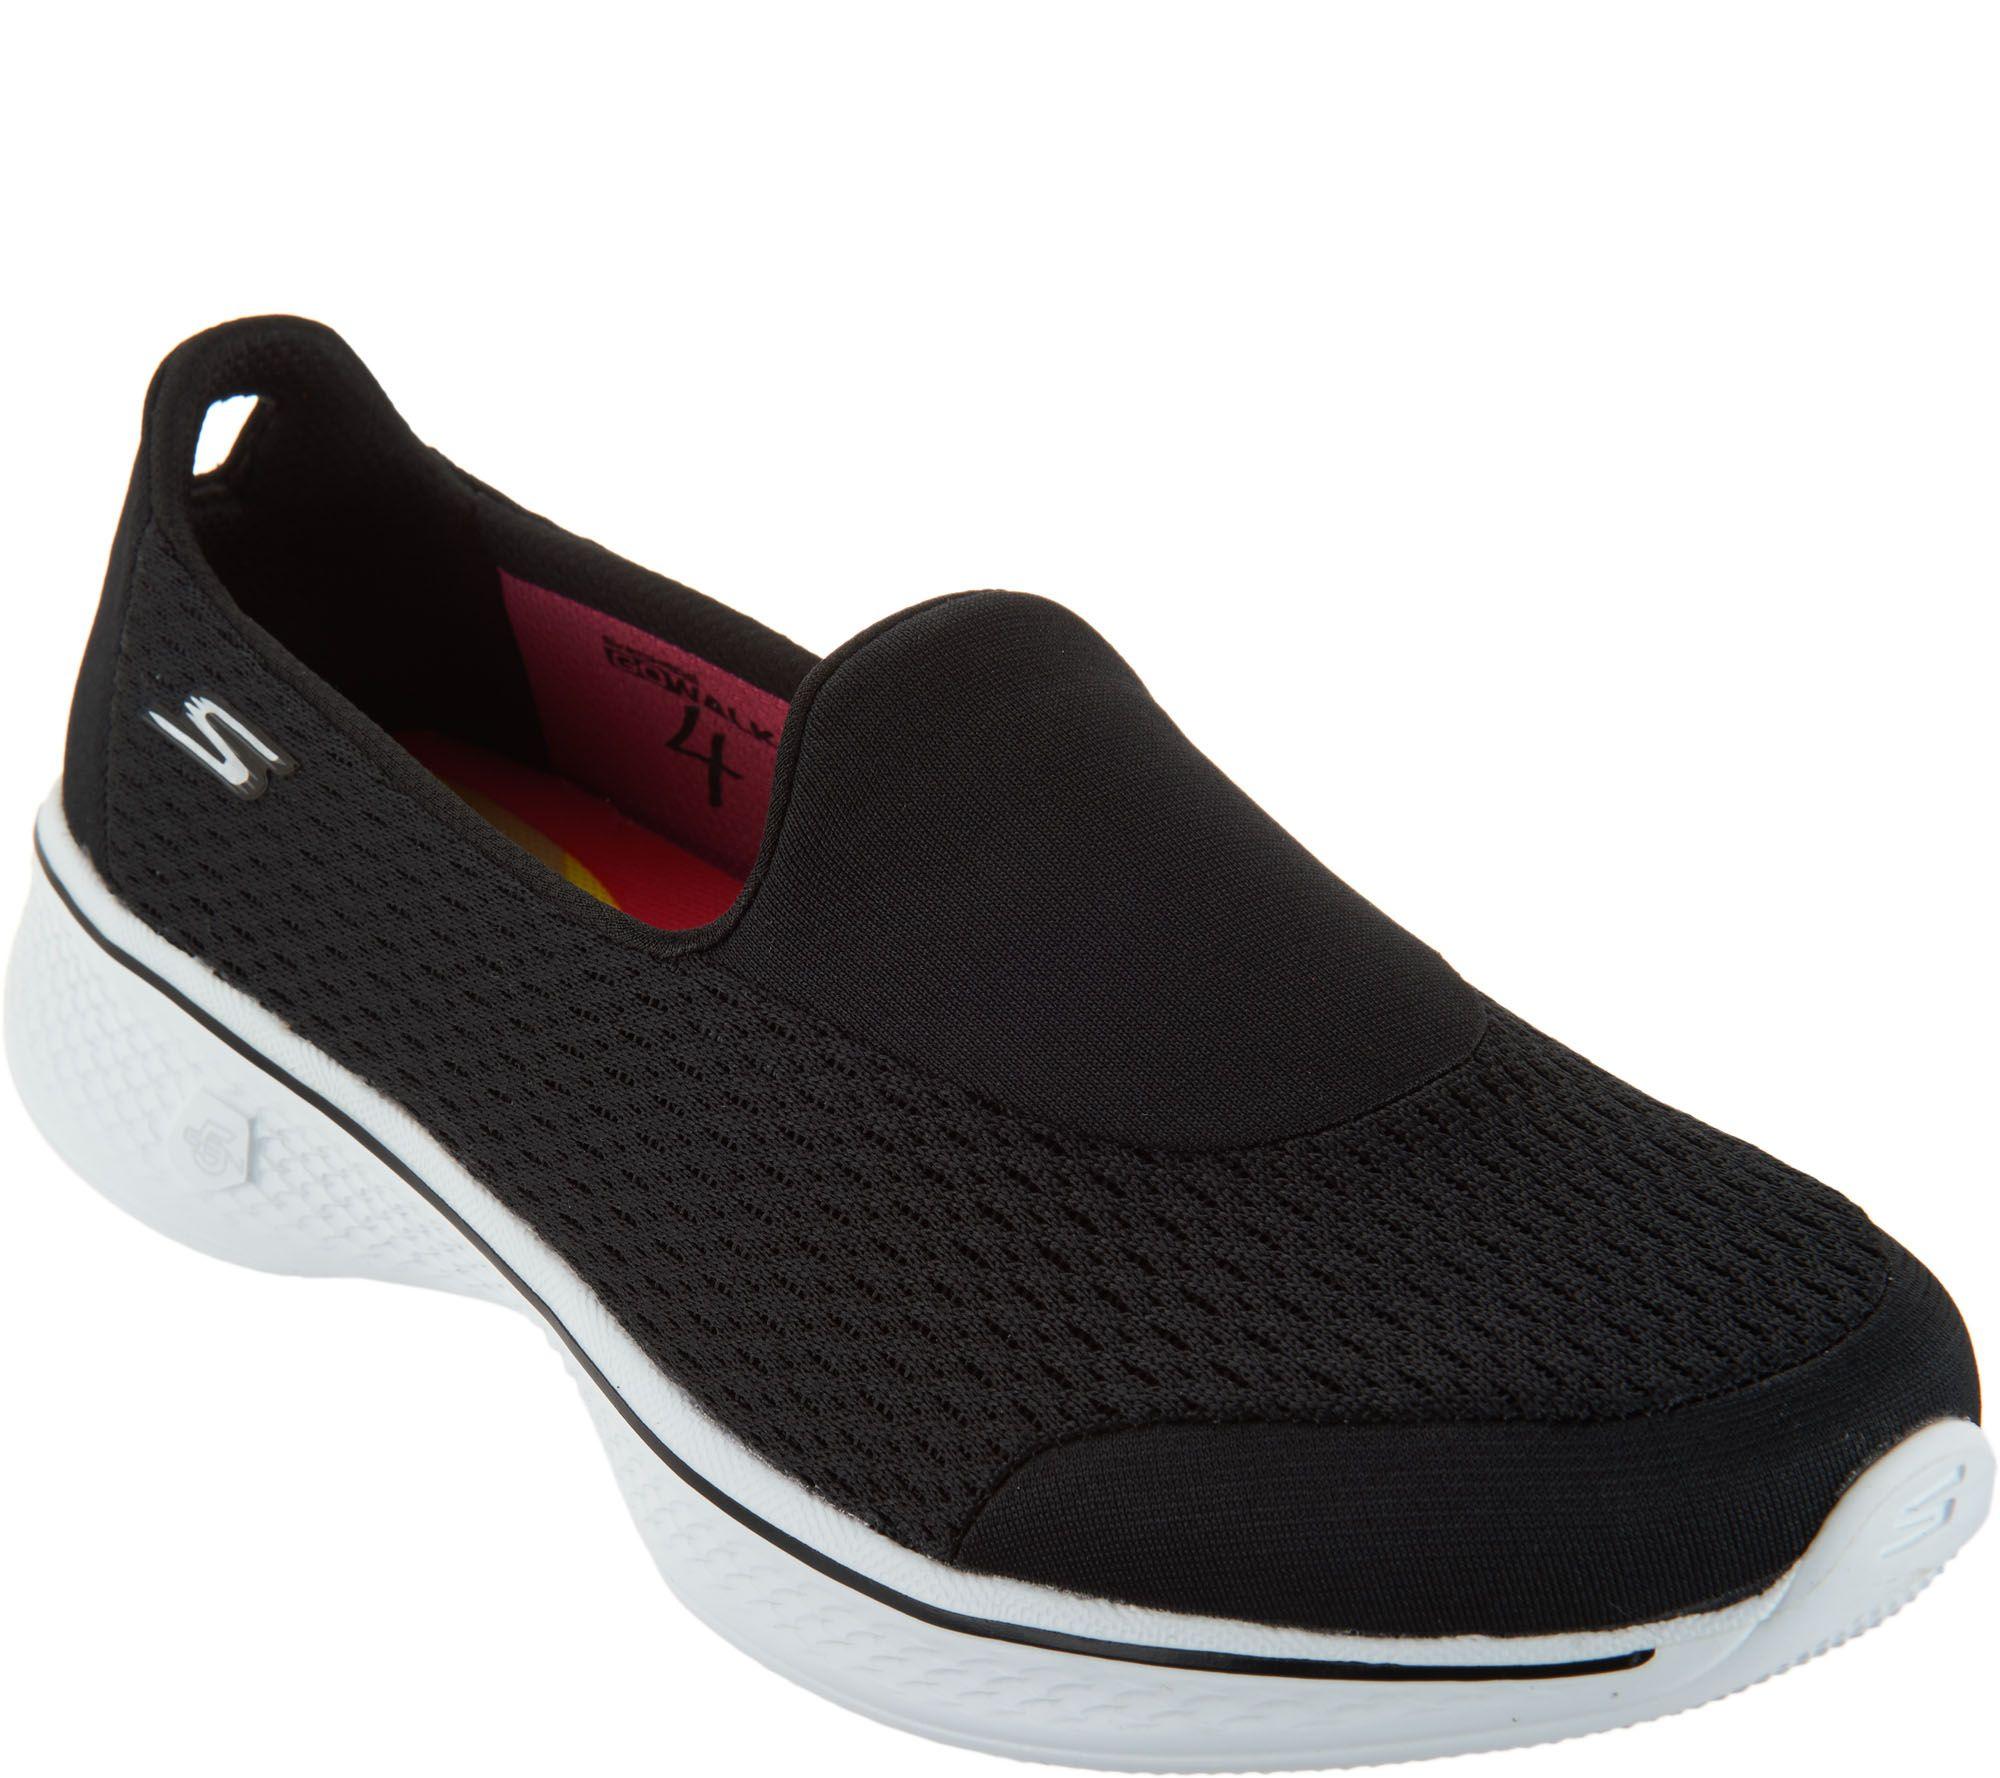 Skechers GOwalk 4 Mesh Slip-ons